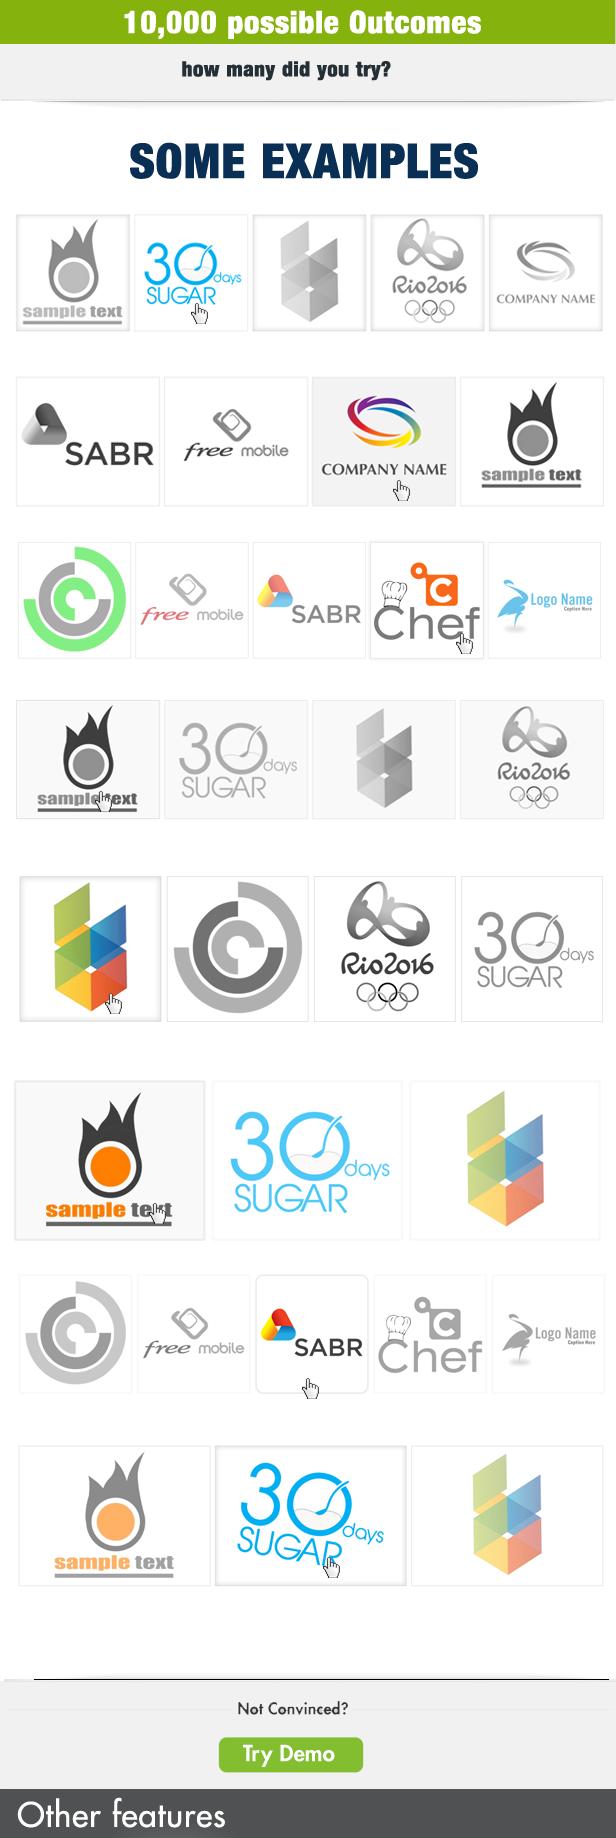 logos5 - Logos Showcase for Visual Composer WordPress